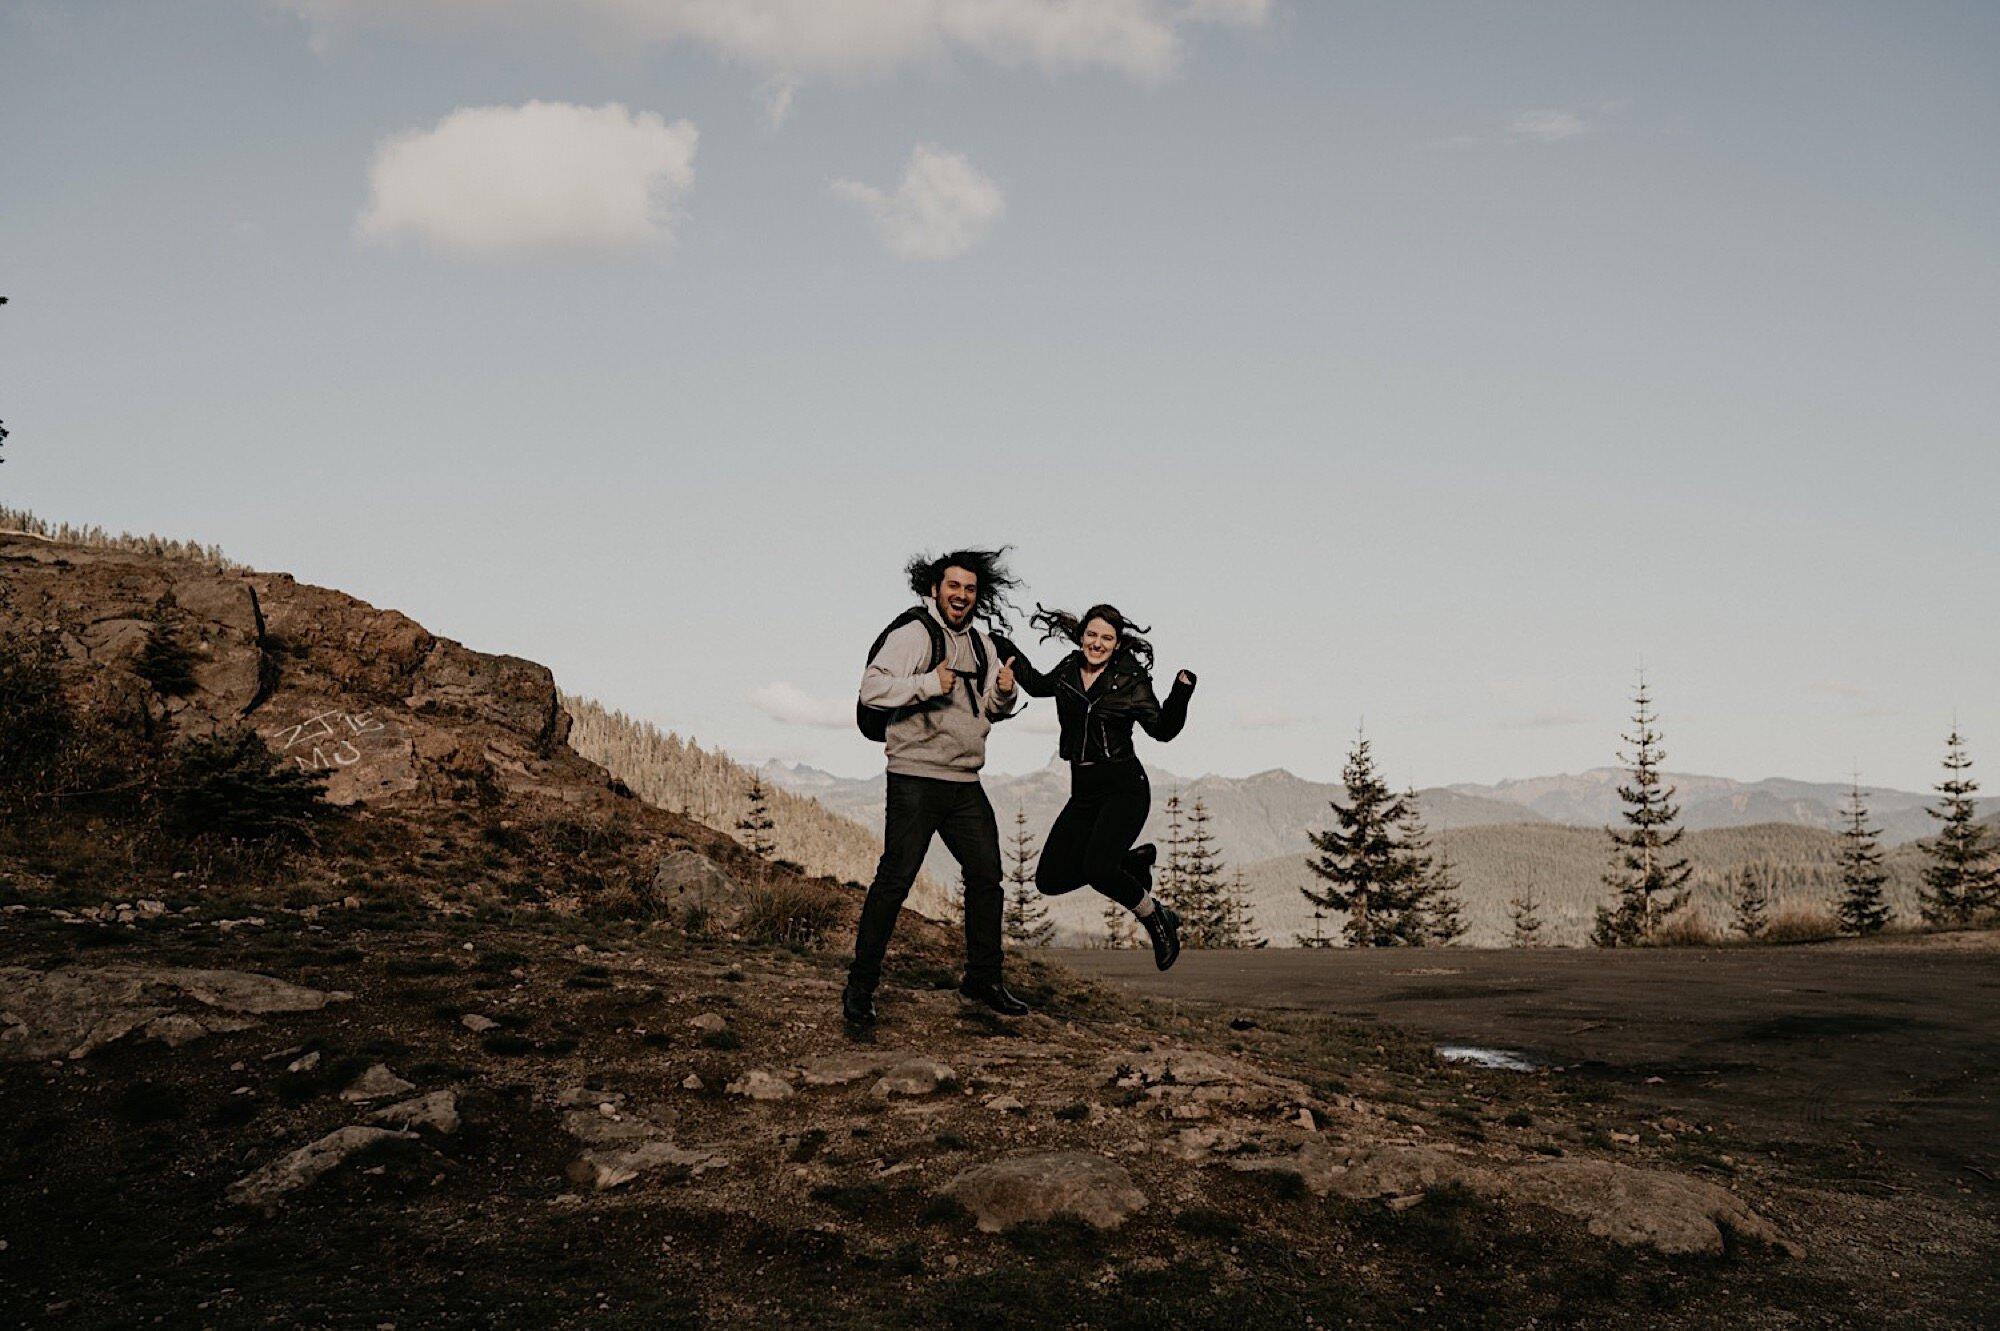 mount-rainier-hiking-adventure-elopement-03.jpg